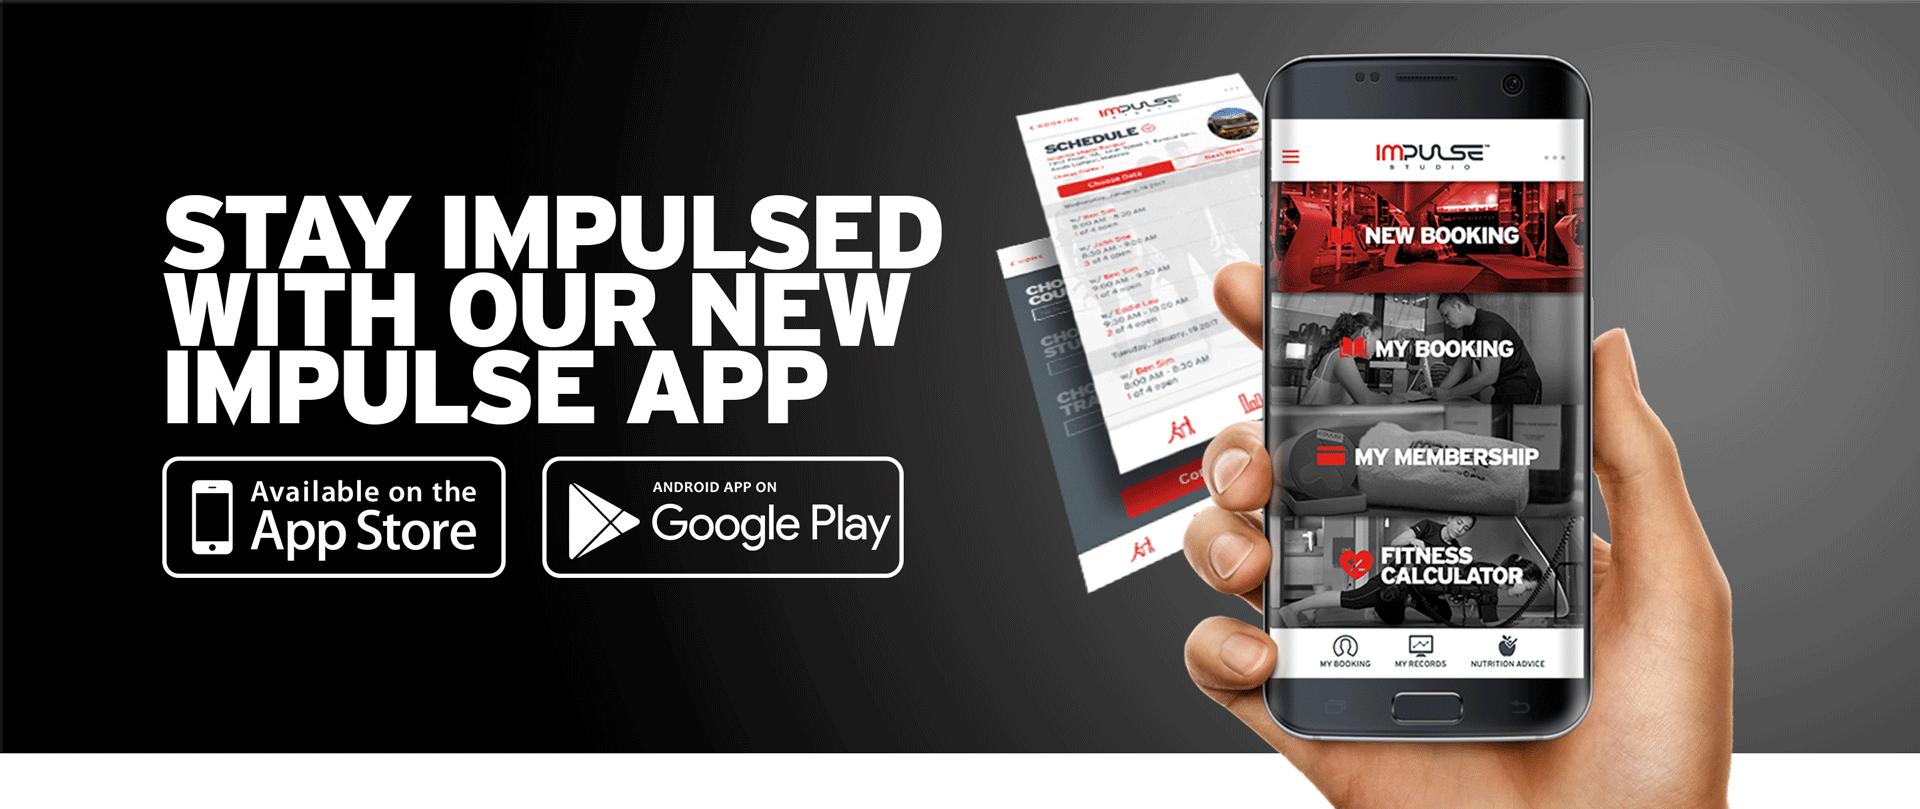 Download the Impulse App